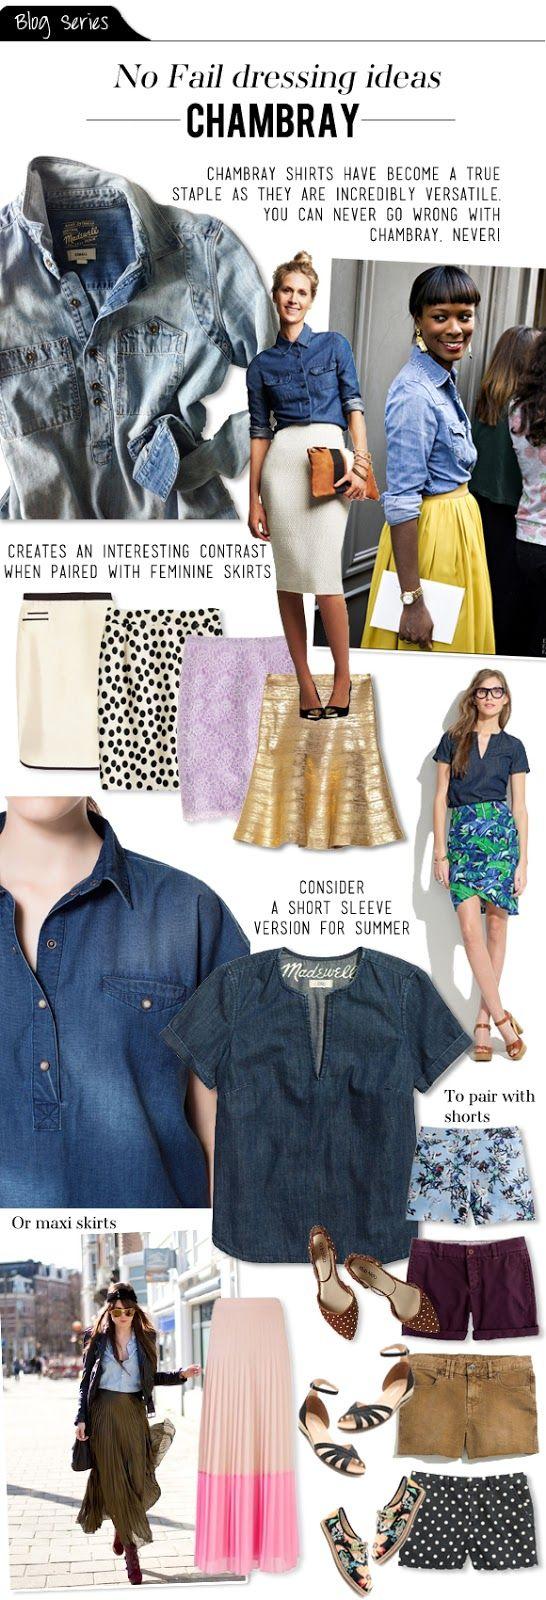 The Vault Files: Blog Series: No fail dressing ideas - Chambray Shirts